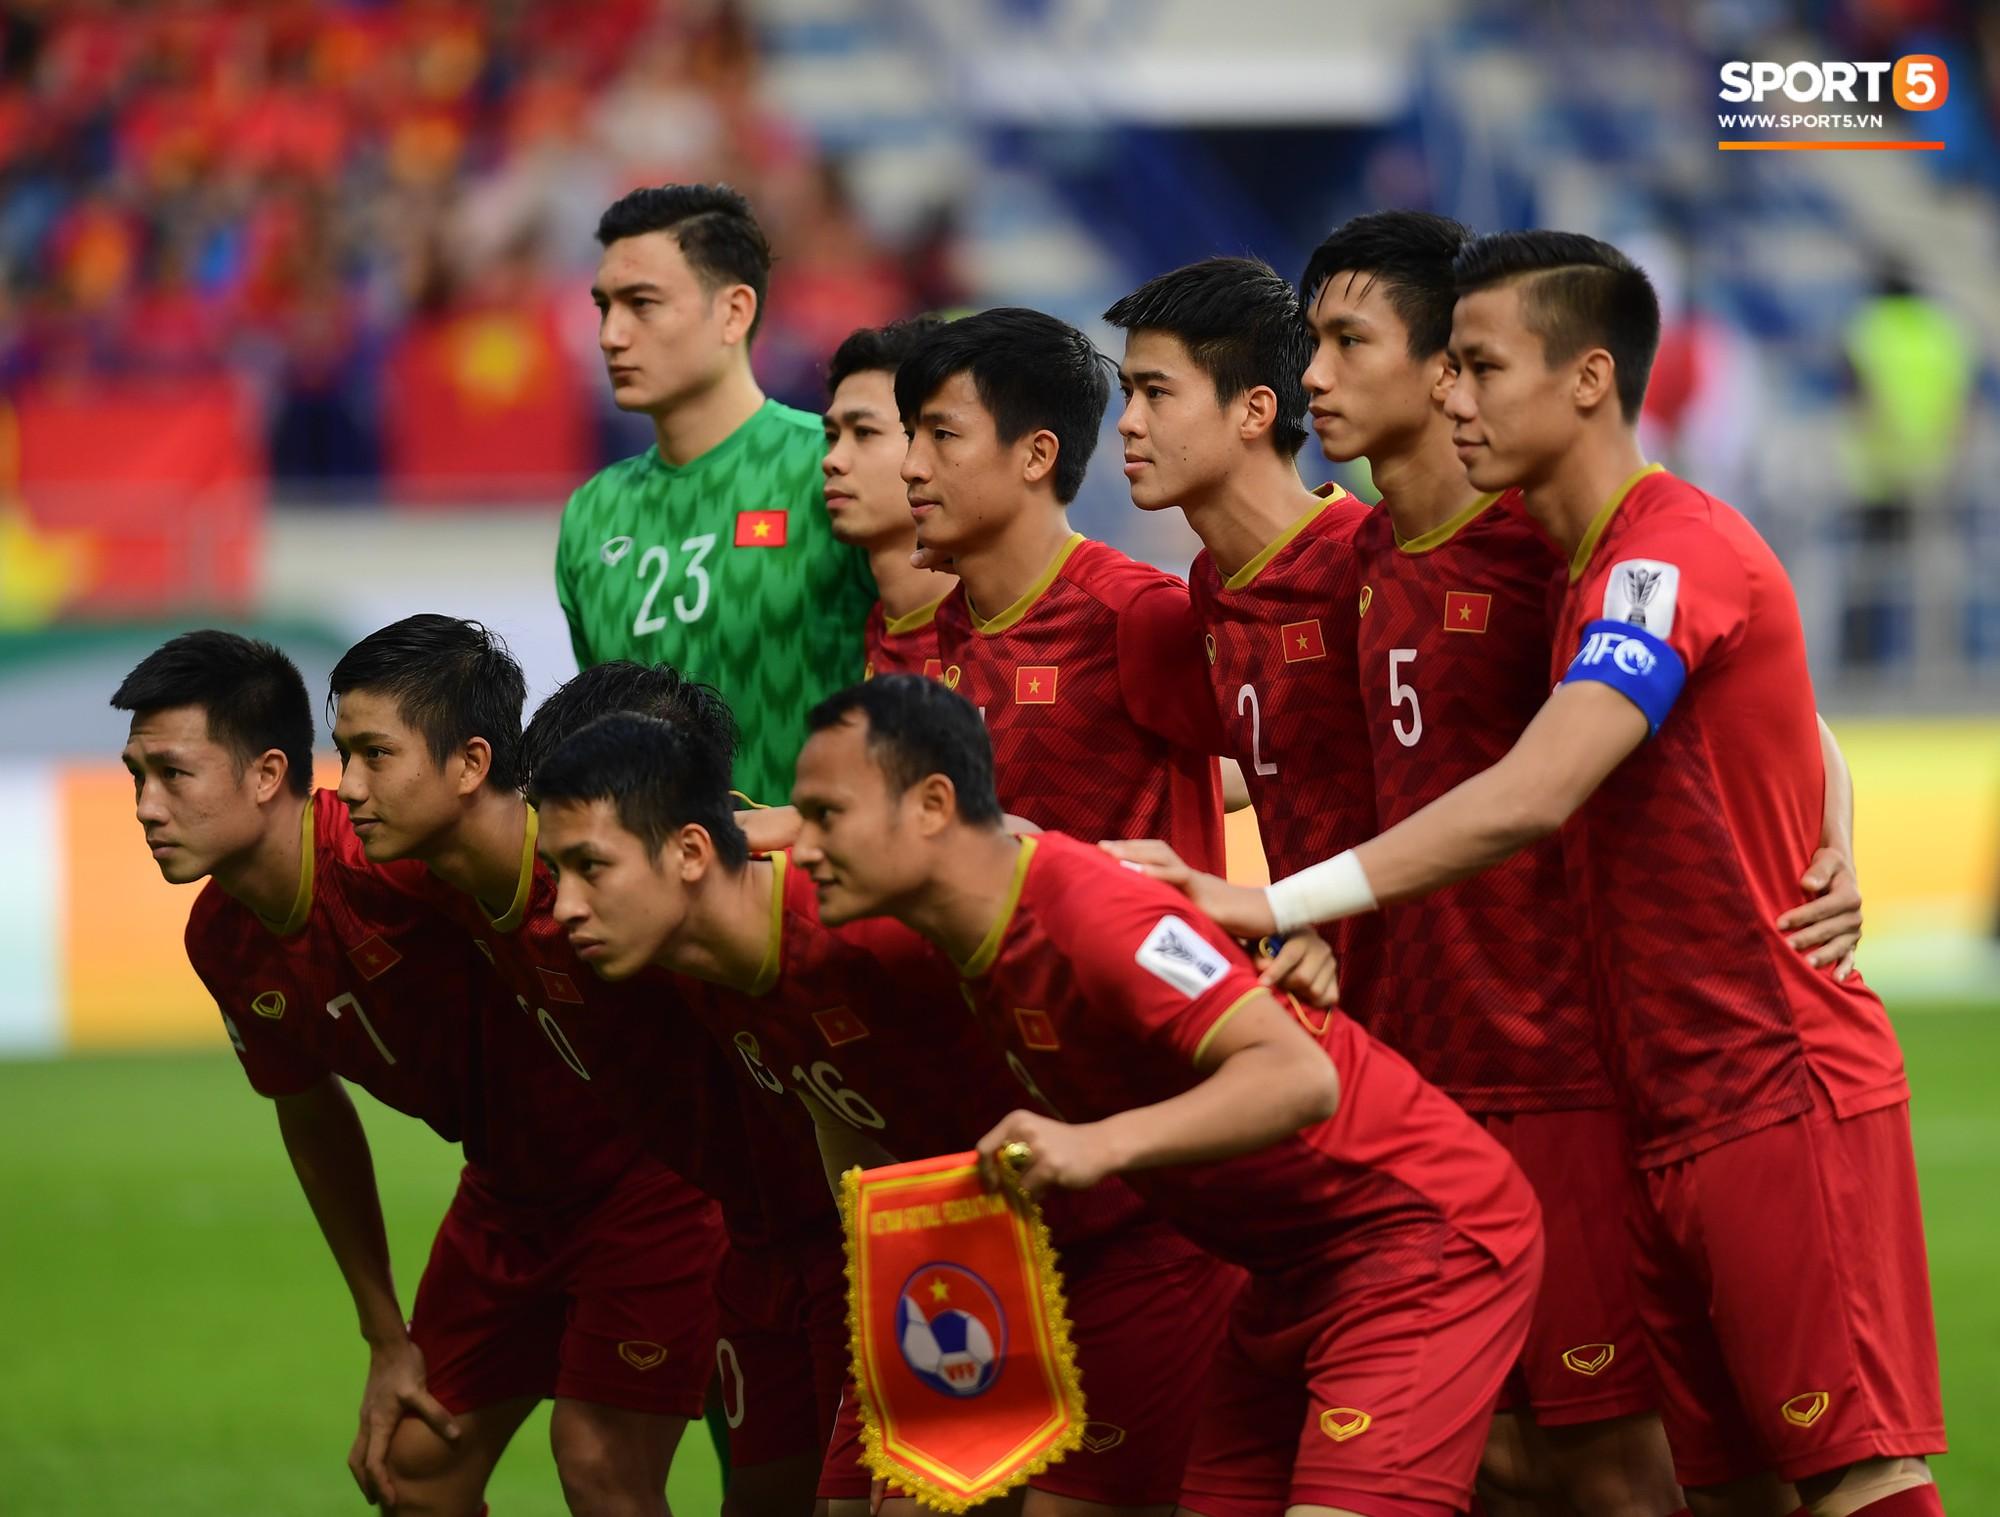 vietnamnhatbanasiancup2019241415490111721451953509919b010c02275cp.jpg